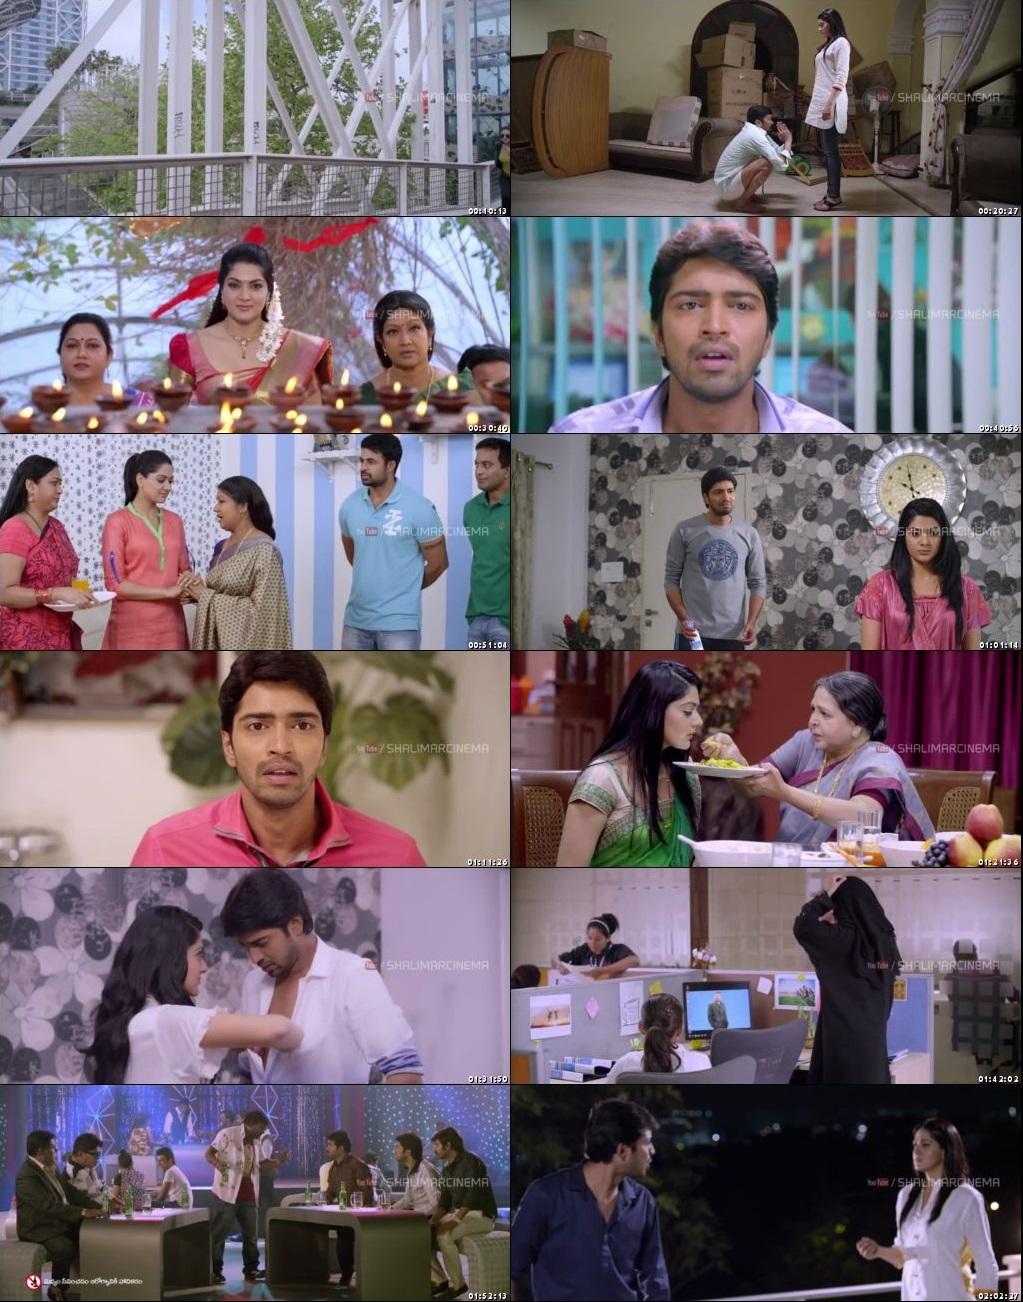 jatt james bond punjabi movie 720p download